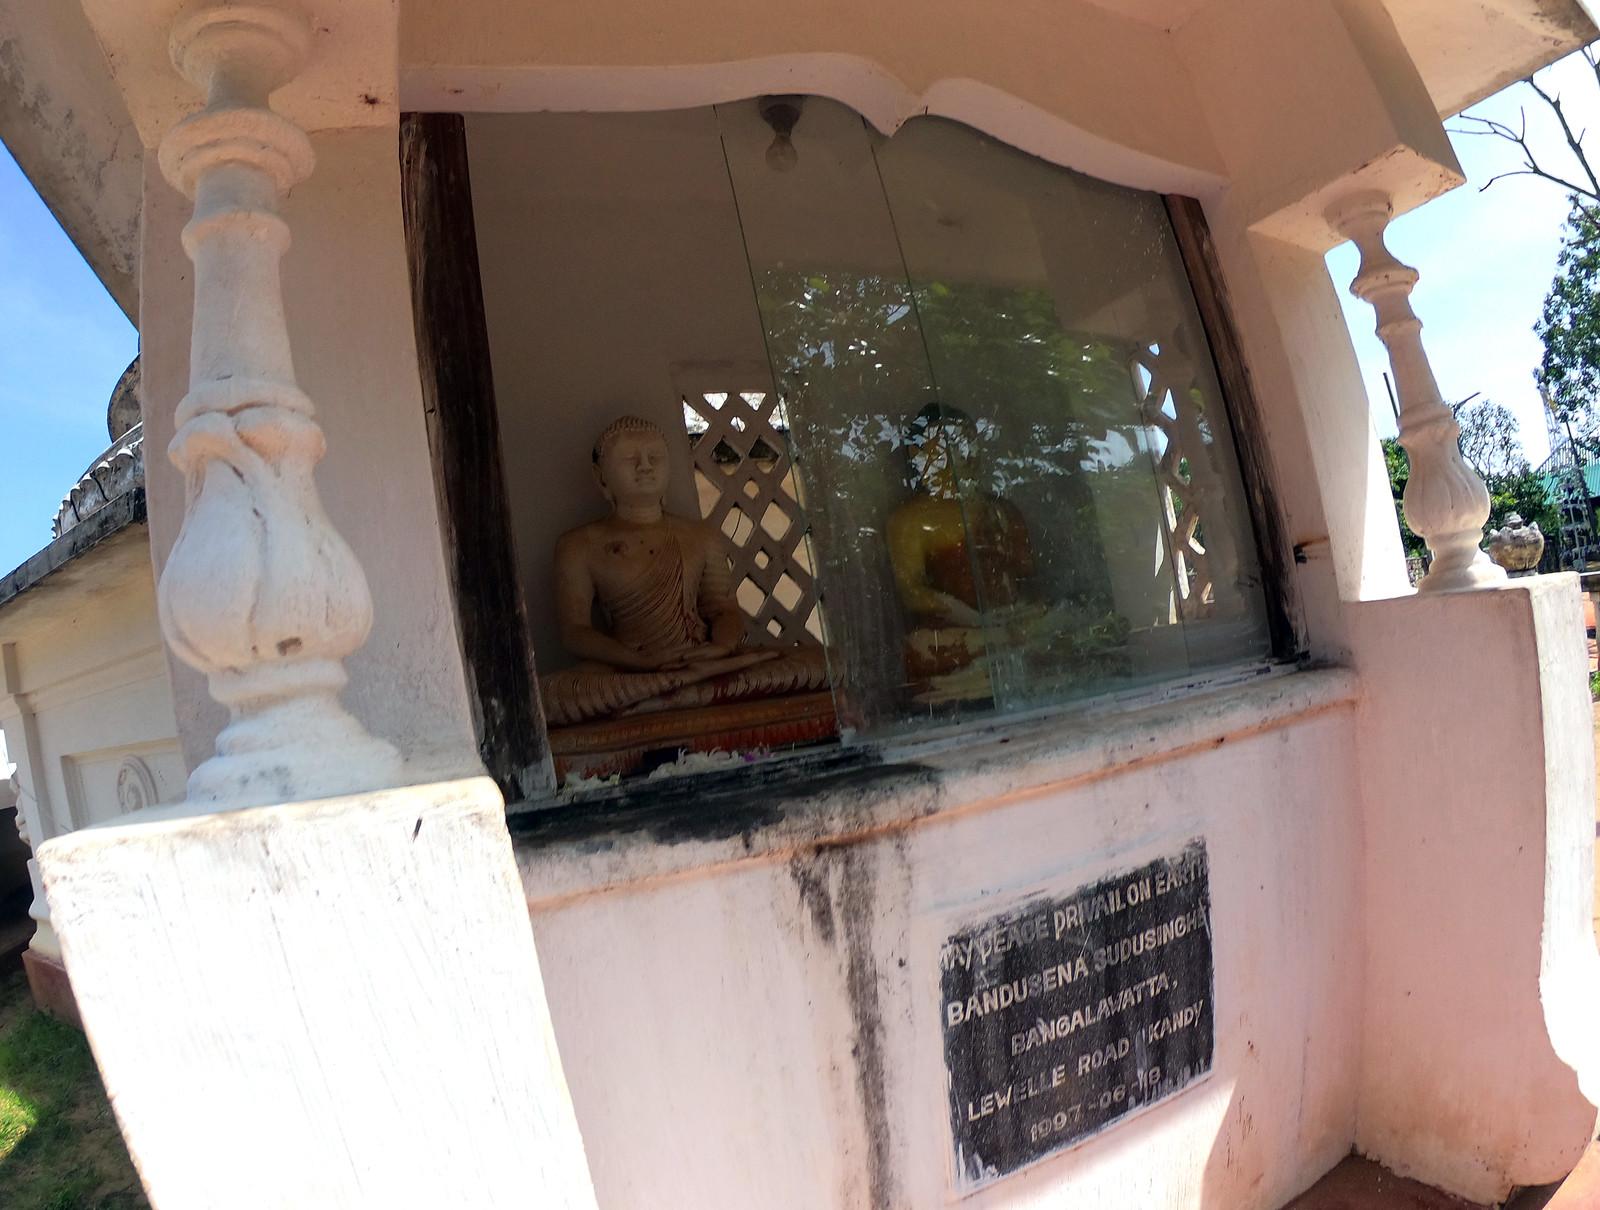 Aukana, la estatua de Buda más alta de Sri Lanka buda de aukana - 46728900722 76d5c19a9a h - Buda de Aukana, la estatua de Buda más alta de Sri Lanka